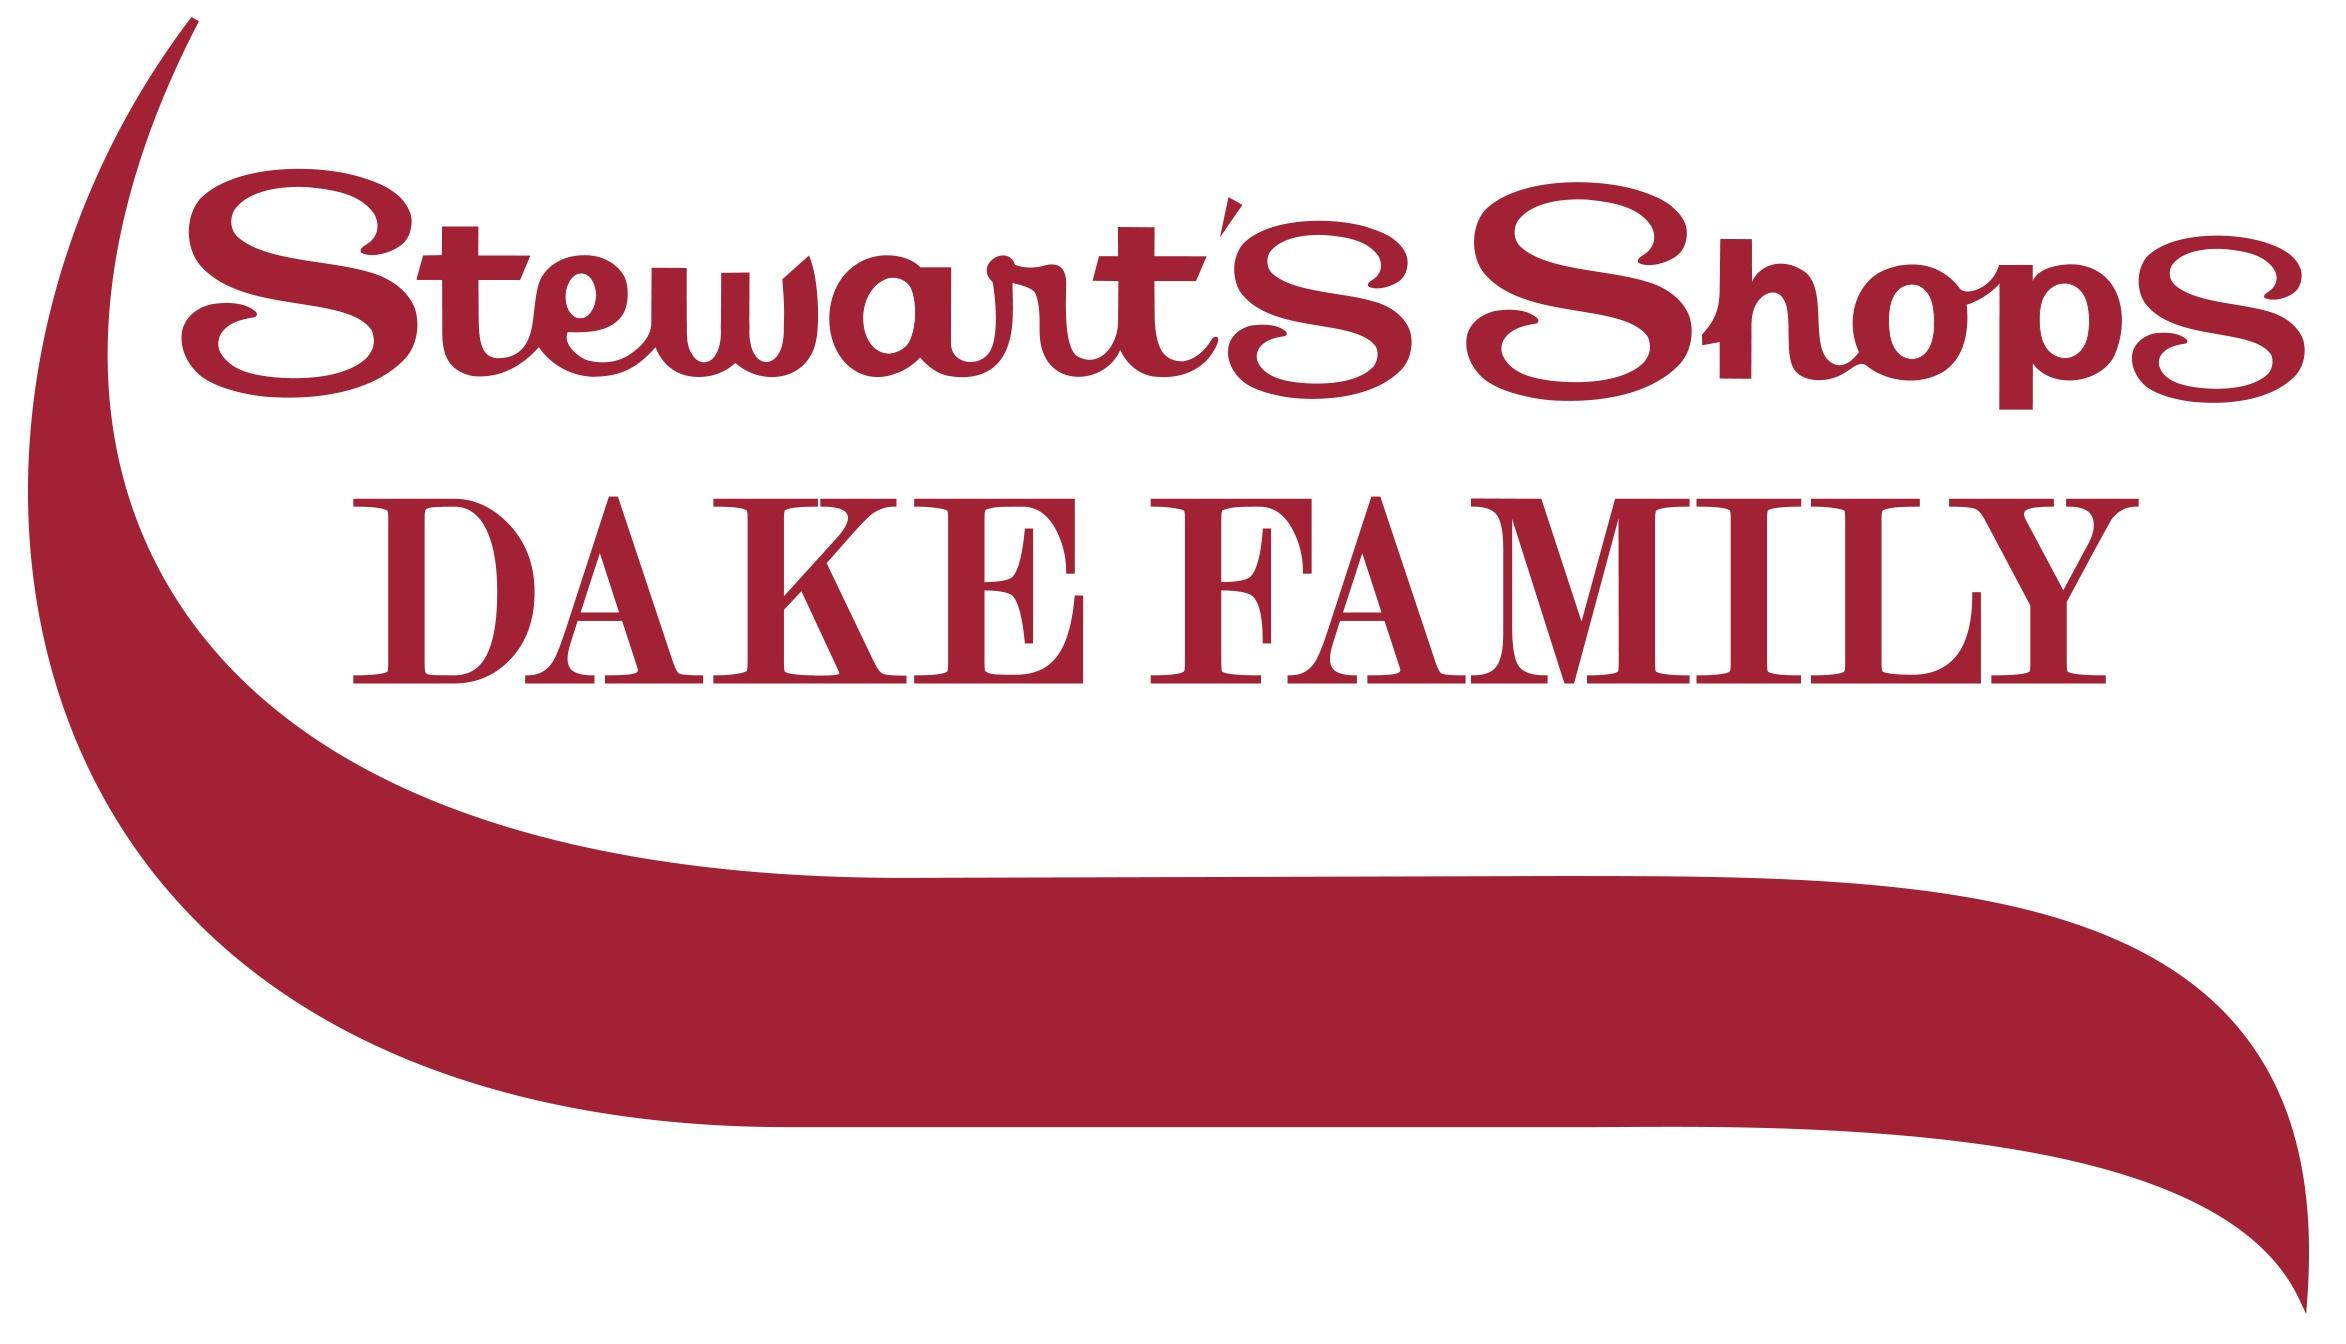 Stewart's Shops Dake Family logo